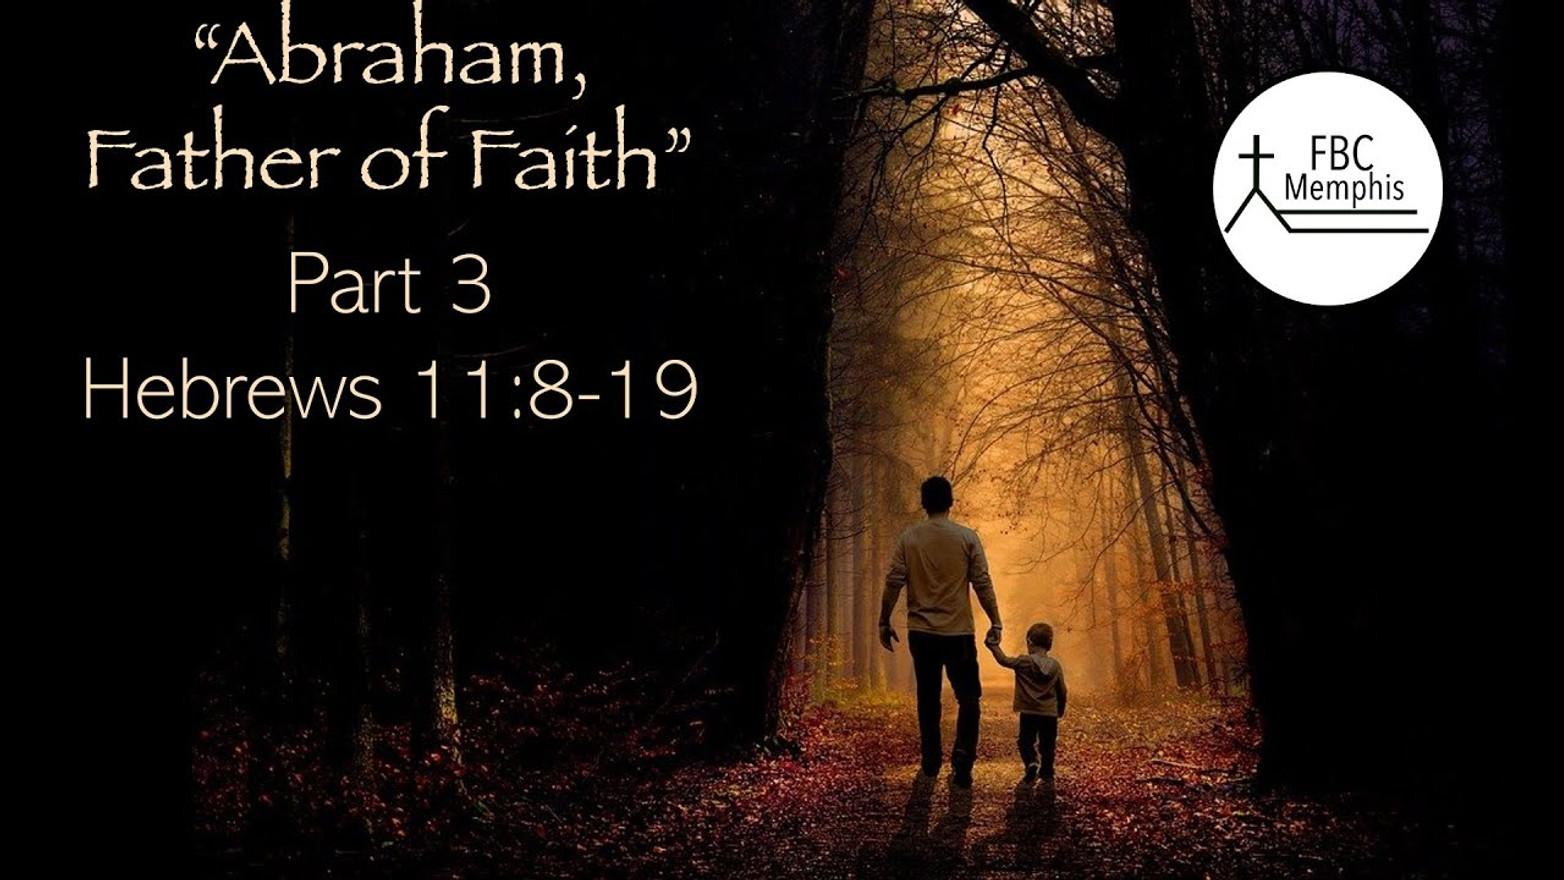 Abraham Father Of Faith (Part 3)